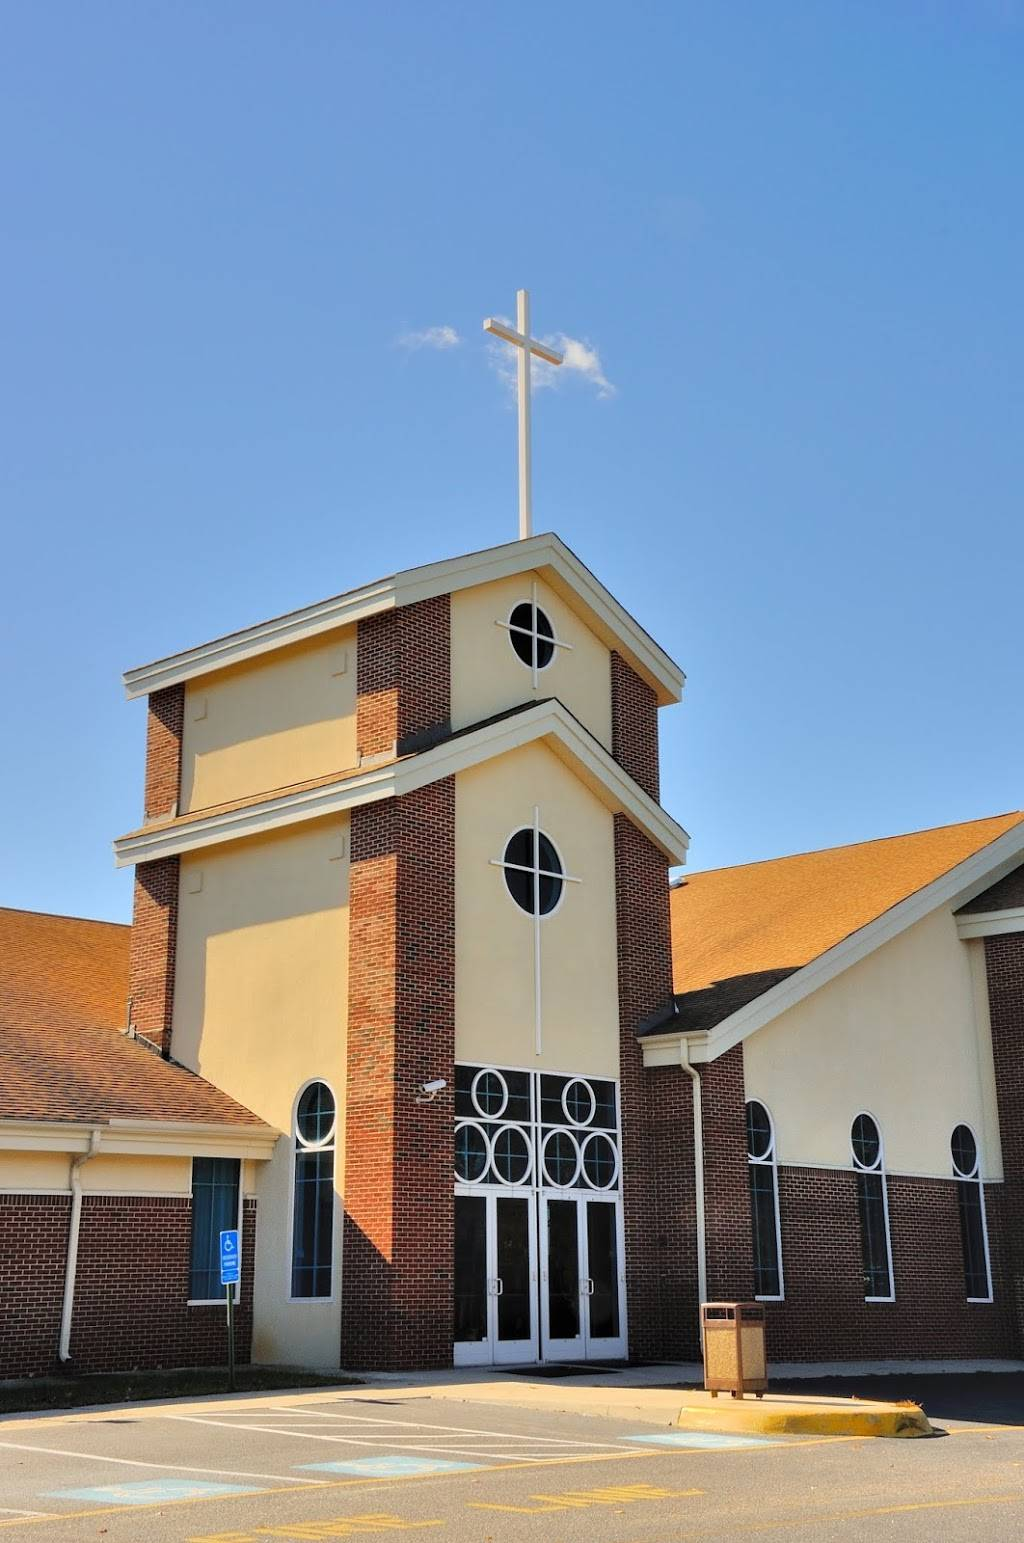 Mount Lebanon Baptist Church - church  | Photo 7 of 8 | Address: 884 Bells Mill Rd, Chesapeake, VA 23322, USA | Phone: (757) 547-3388